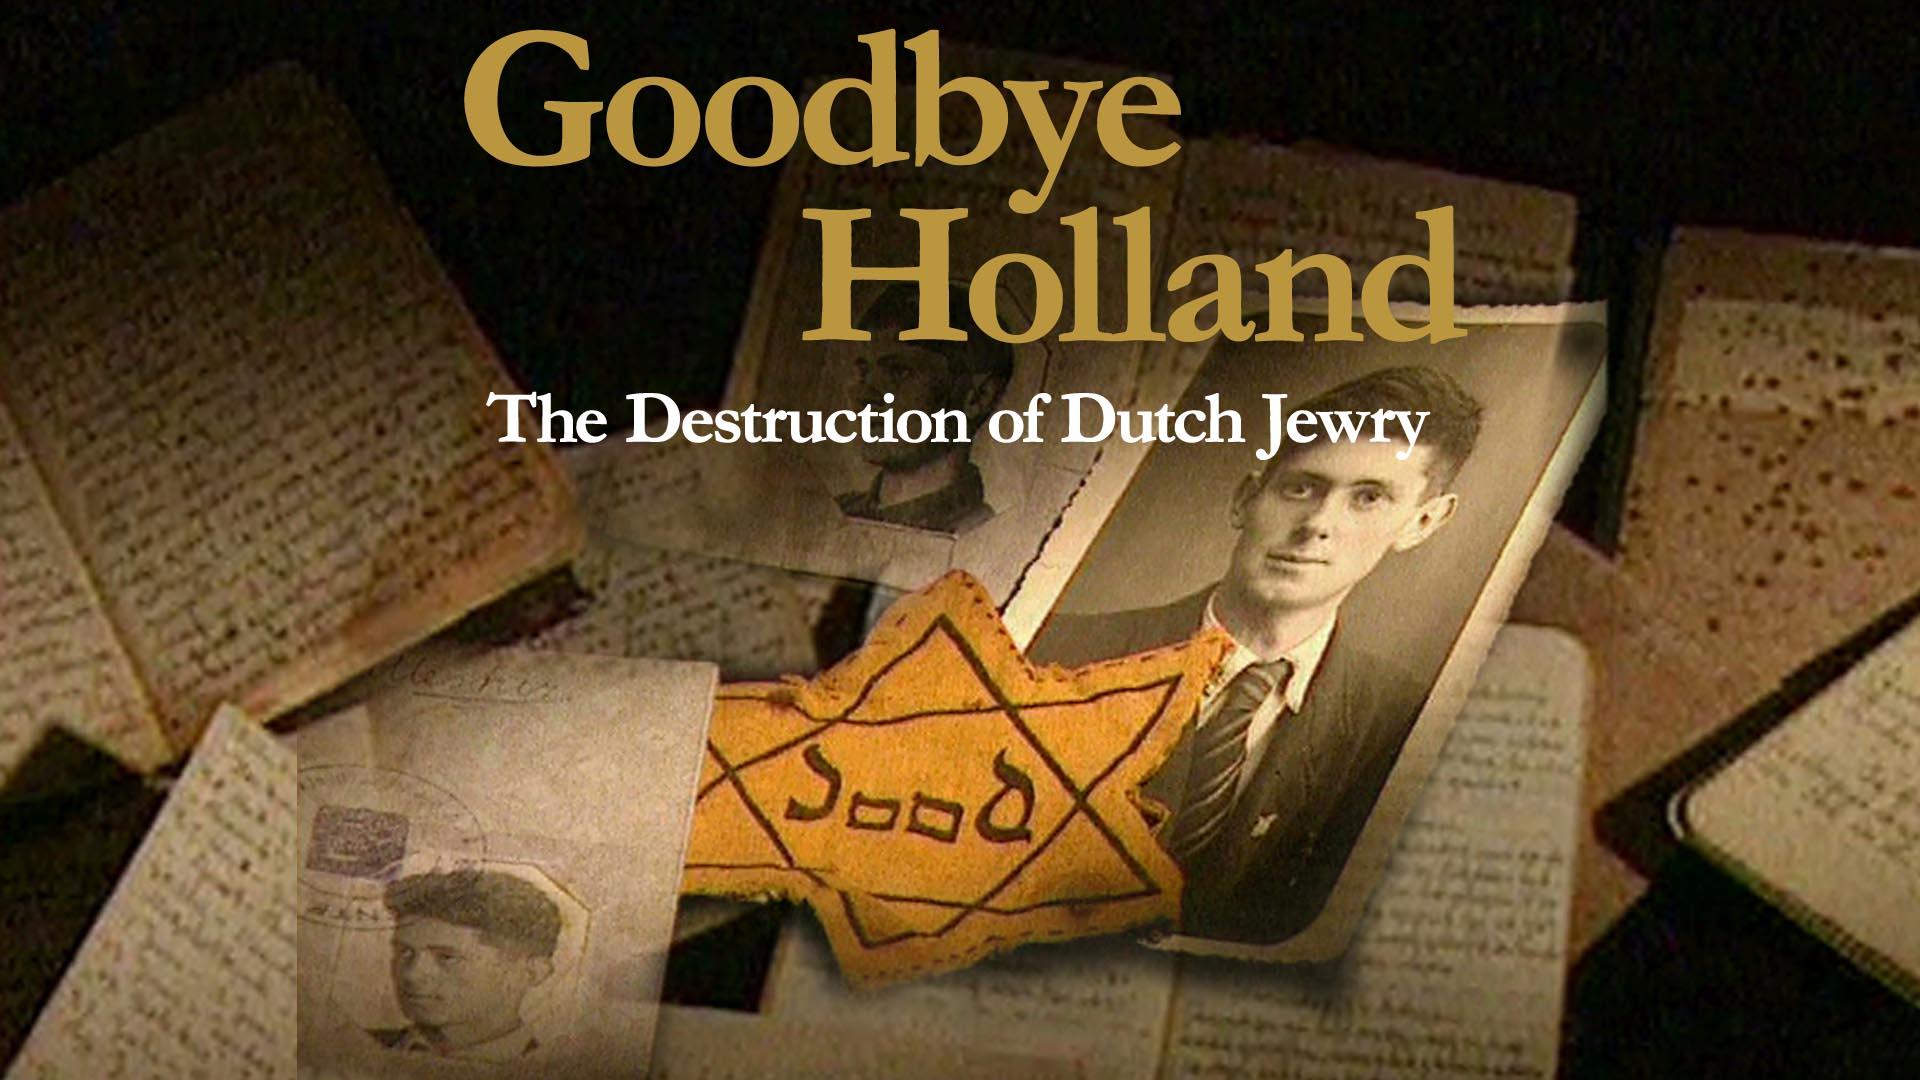 Goodbye Holland: The Destruction of Dutch Jewry